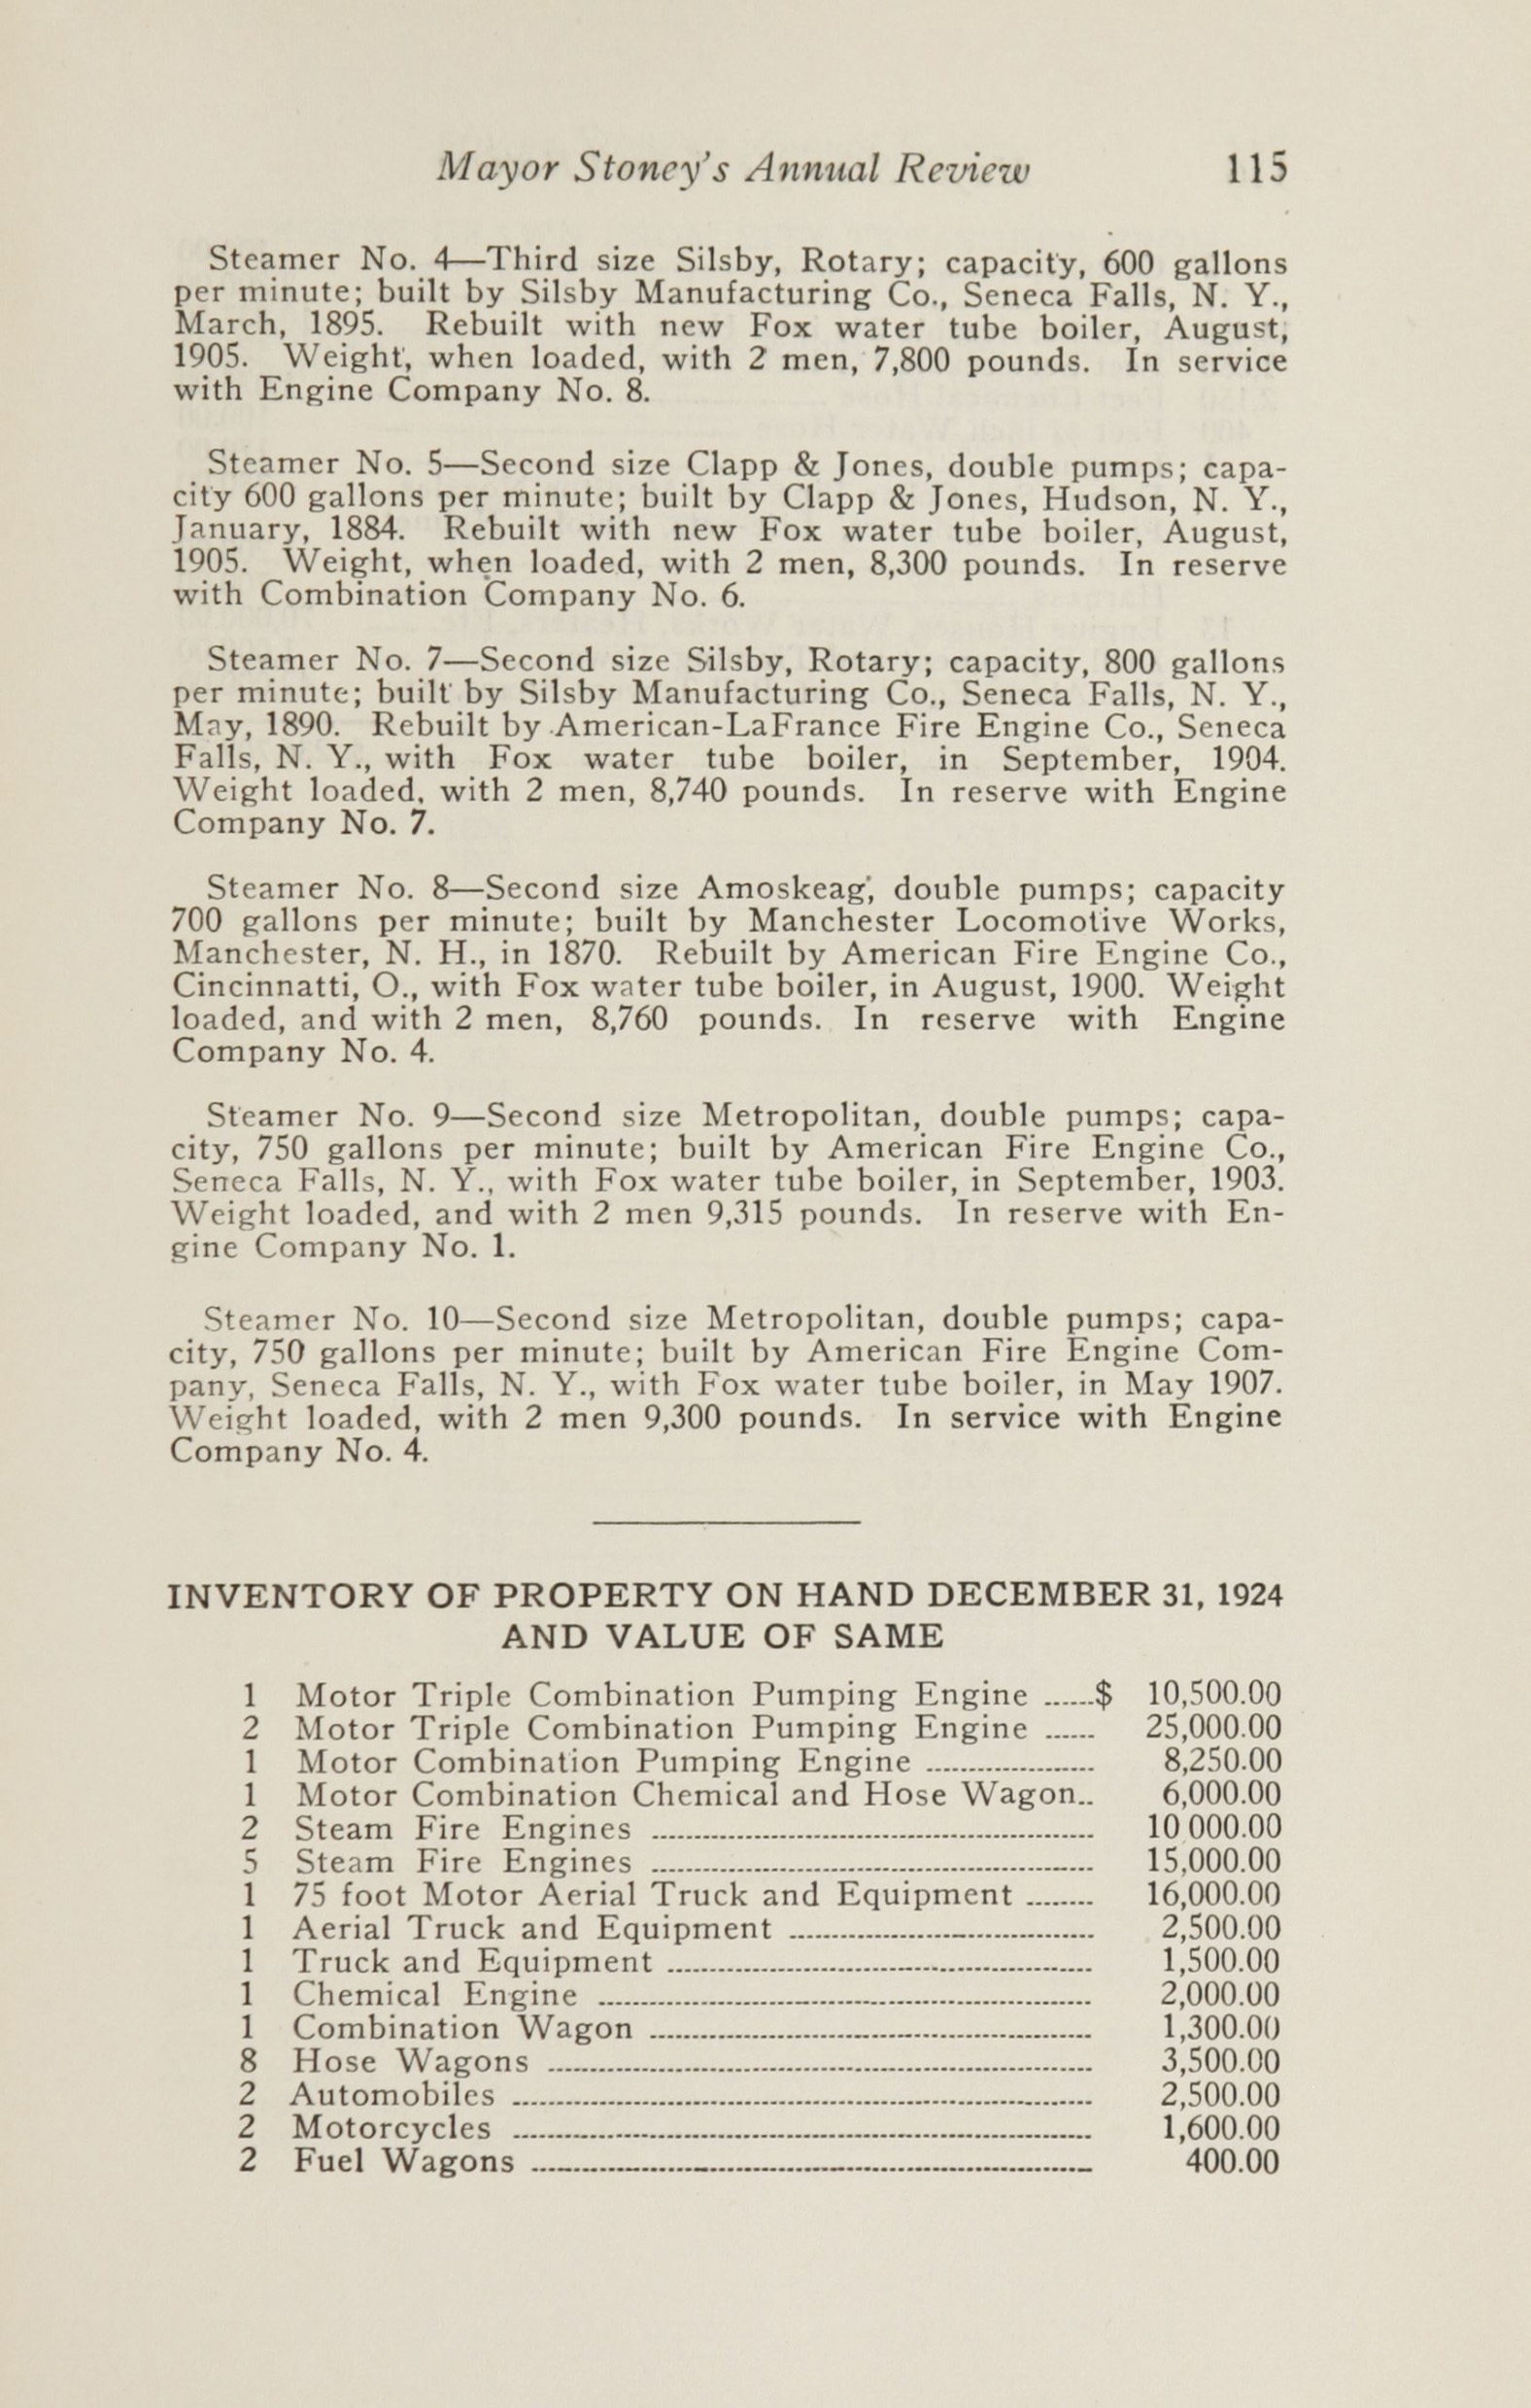 Charleston Yearbook, 1924, page 115